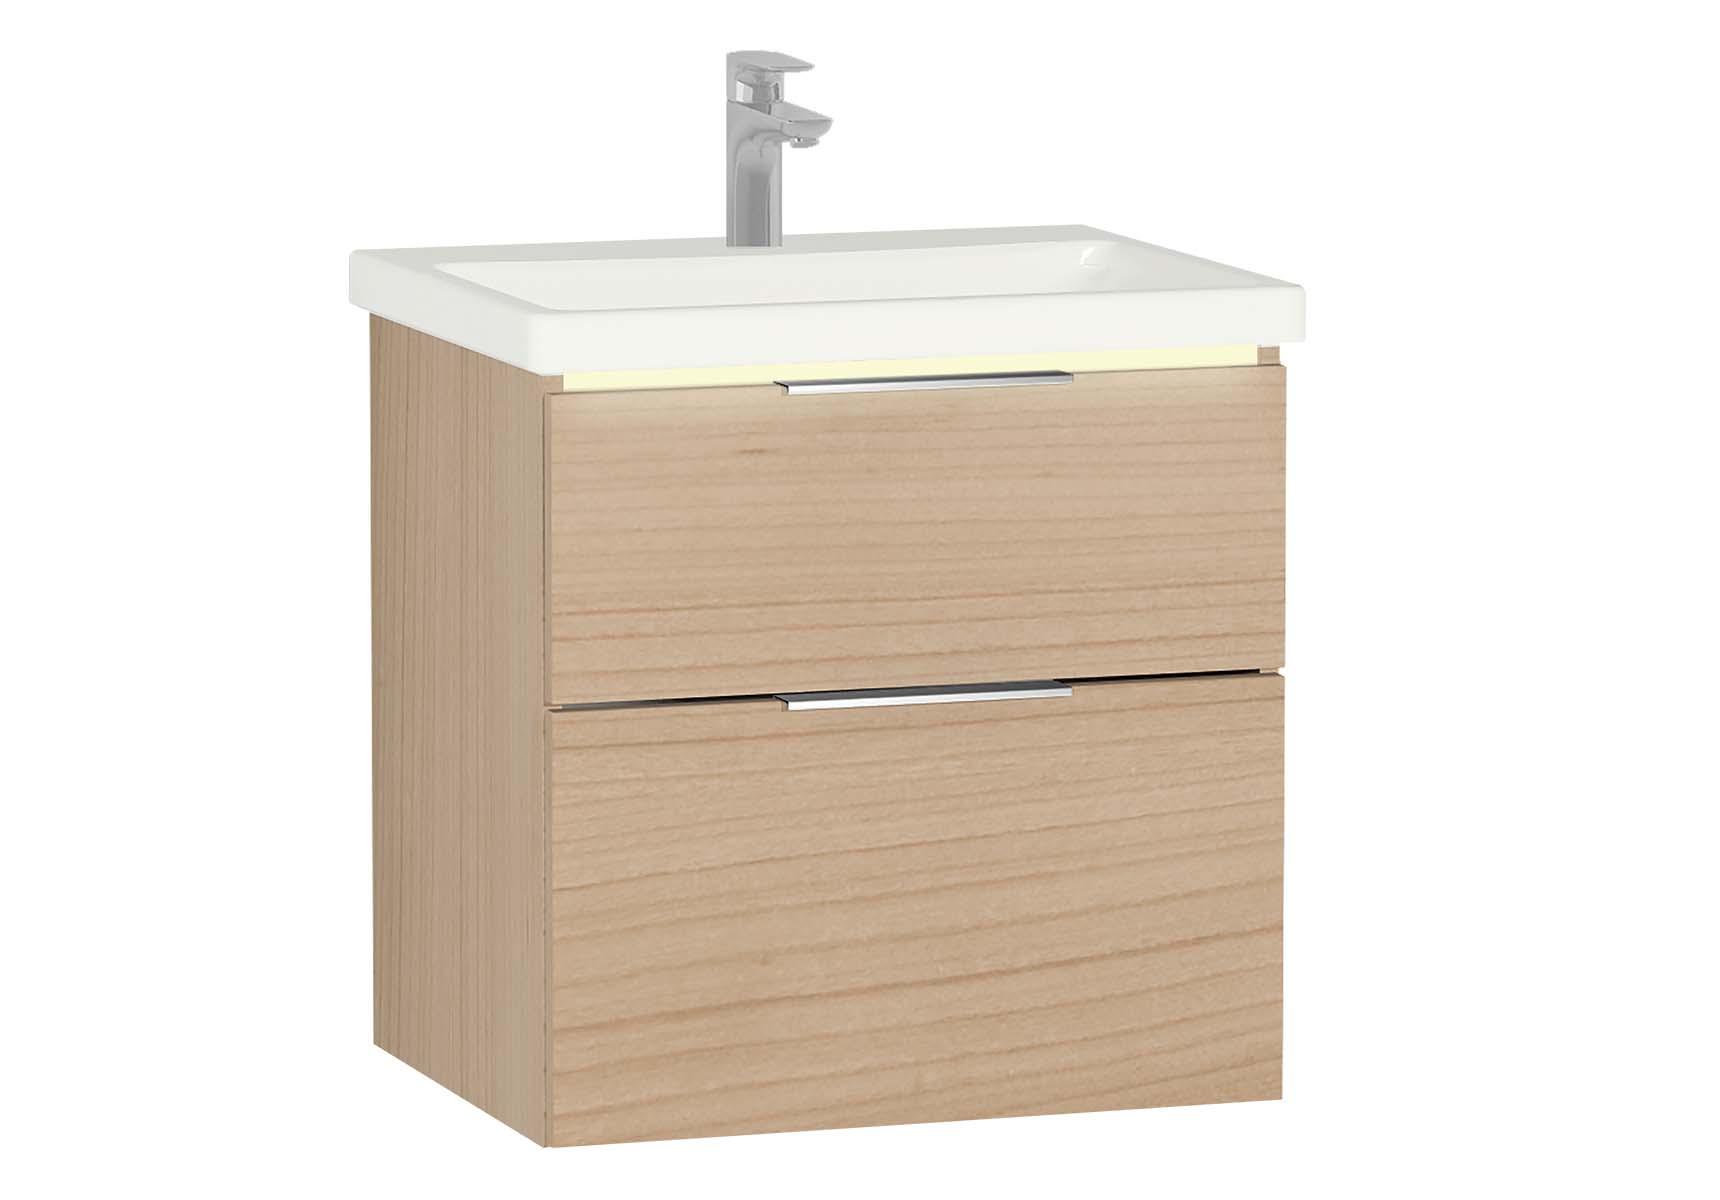 Central Washbasin Unit with 2 drawers, 60 cm, Golden Cherry, Ceramic Washbasin, Led